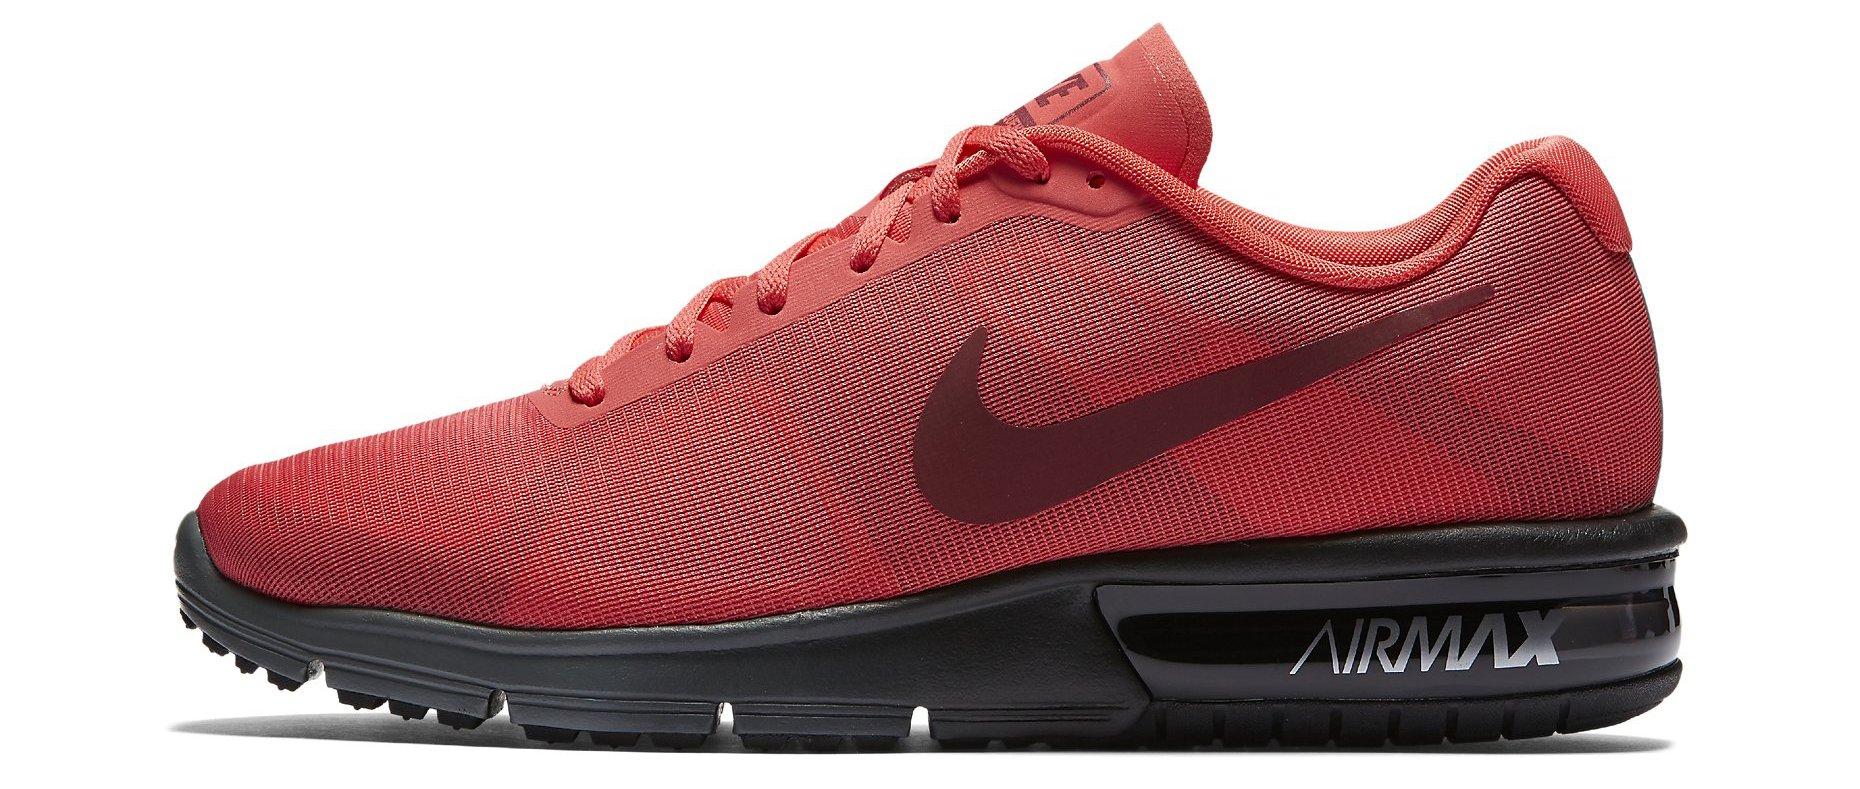 Běžecké boty Nike Air Max Sequent